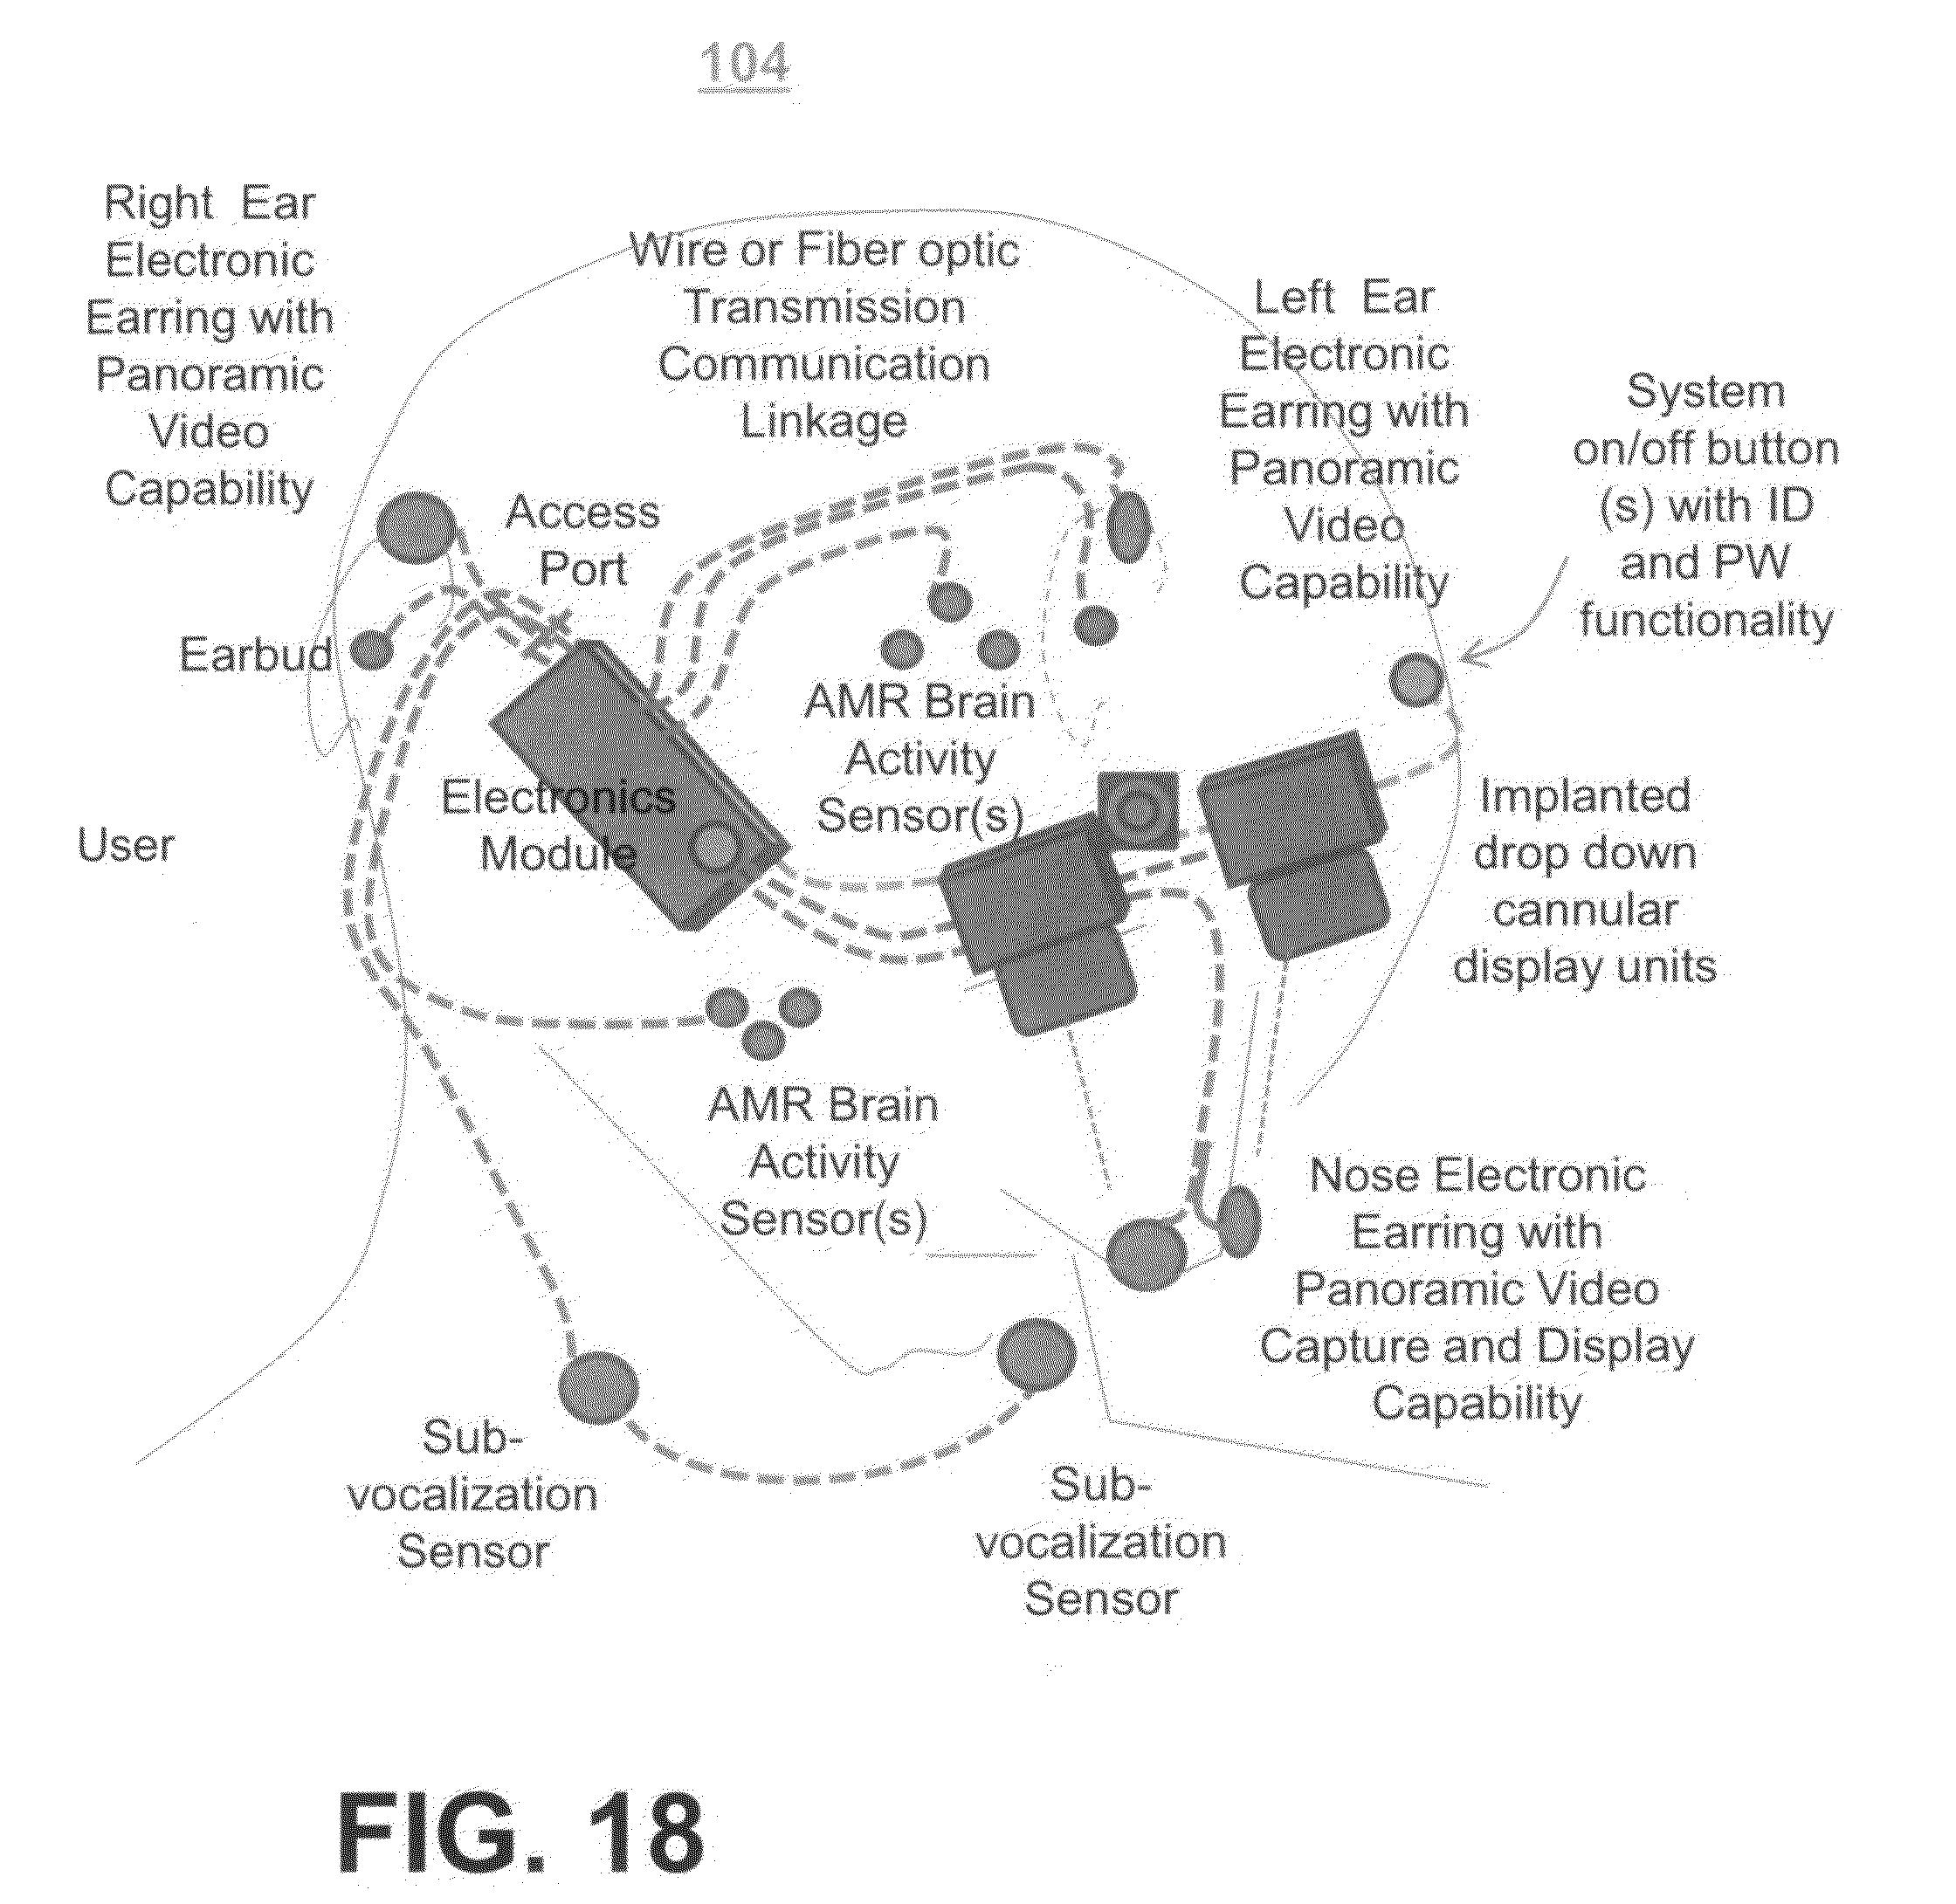 Us20130063550 Human Environment Life Logging Christmas Tree Light Wiring Diagram Caroldoey Patent Drawing